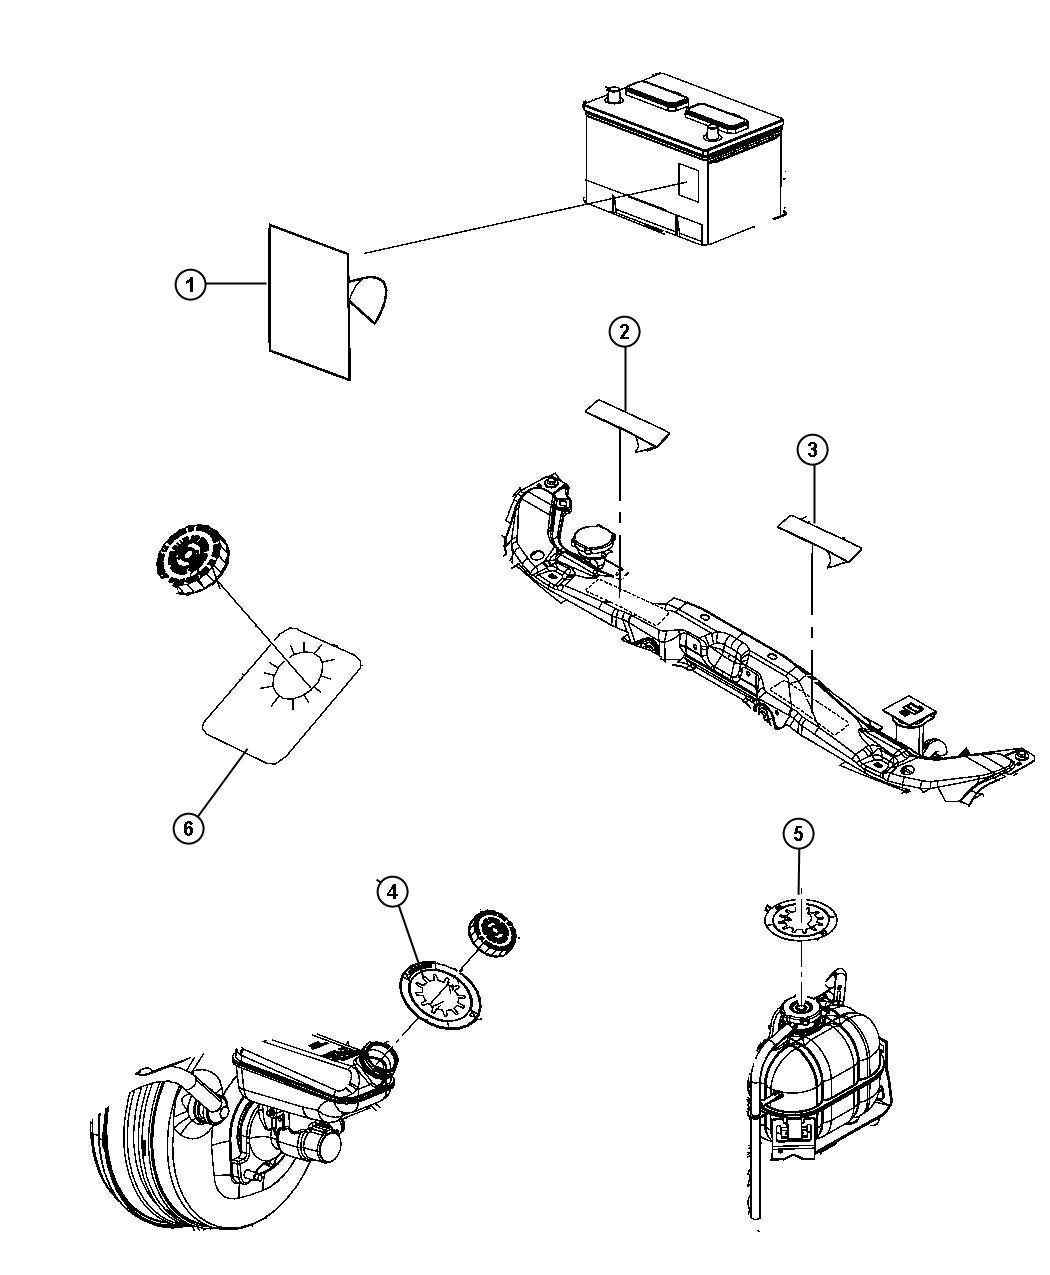 chrysler 200 label a c spec air conditioning system. Black Bedroom Furniture Sets. Home Design Ideas